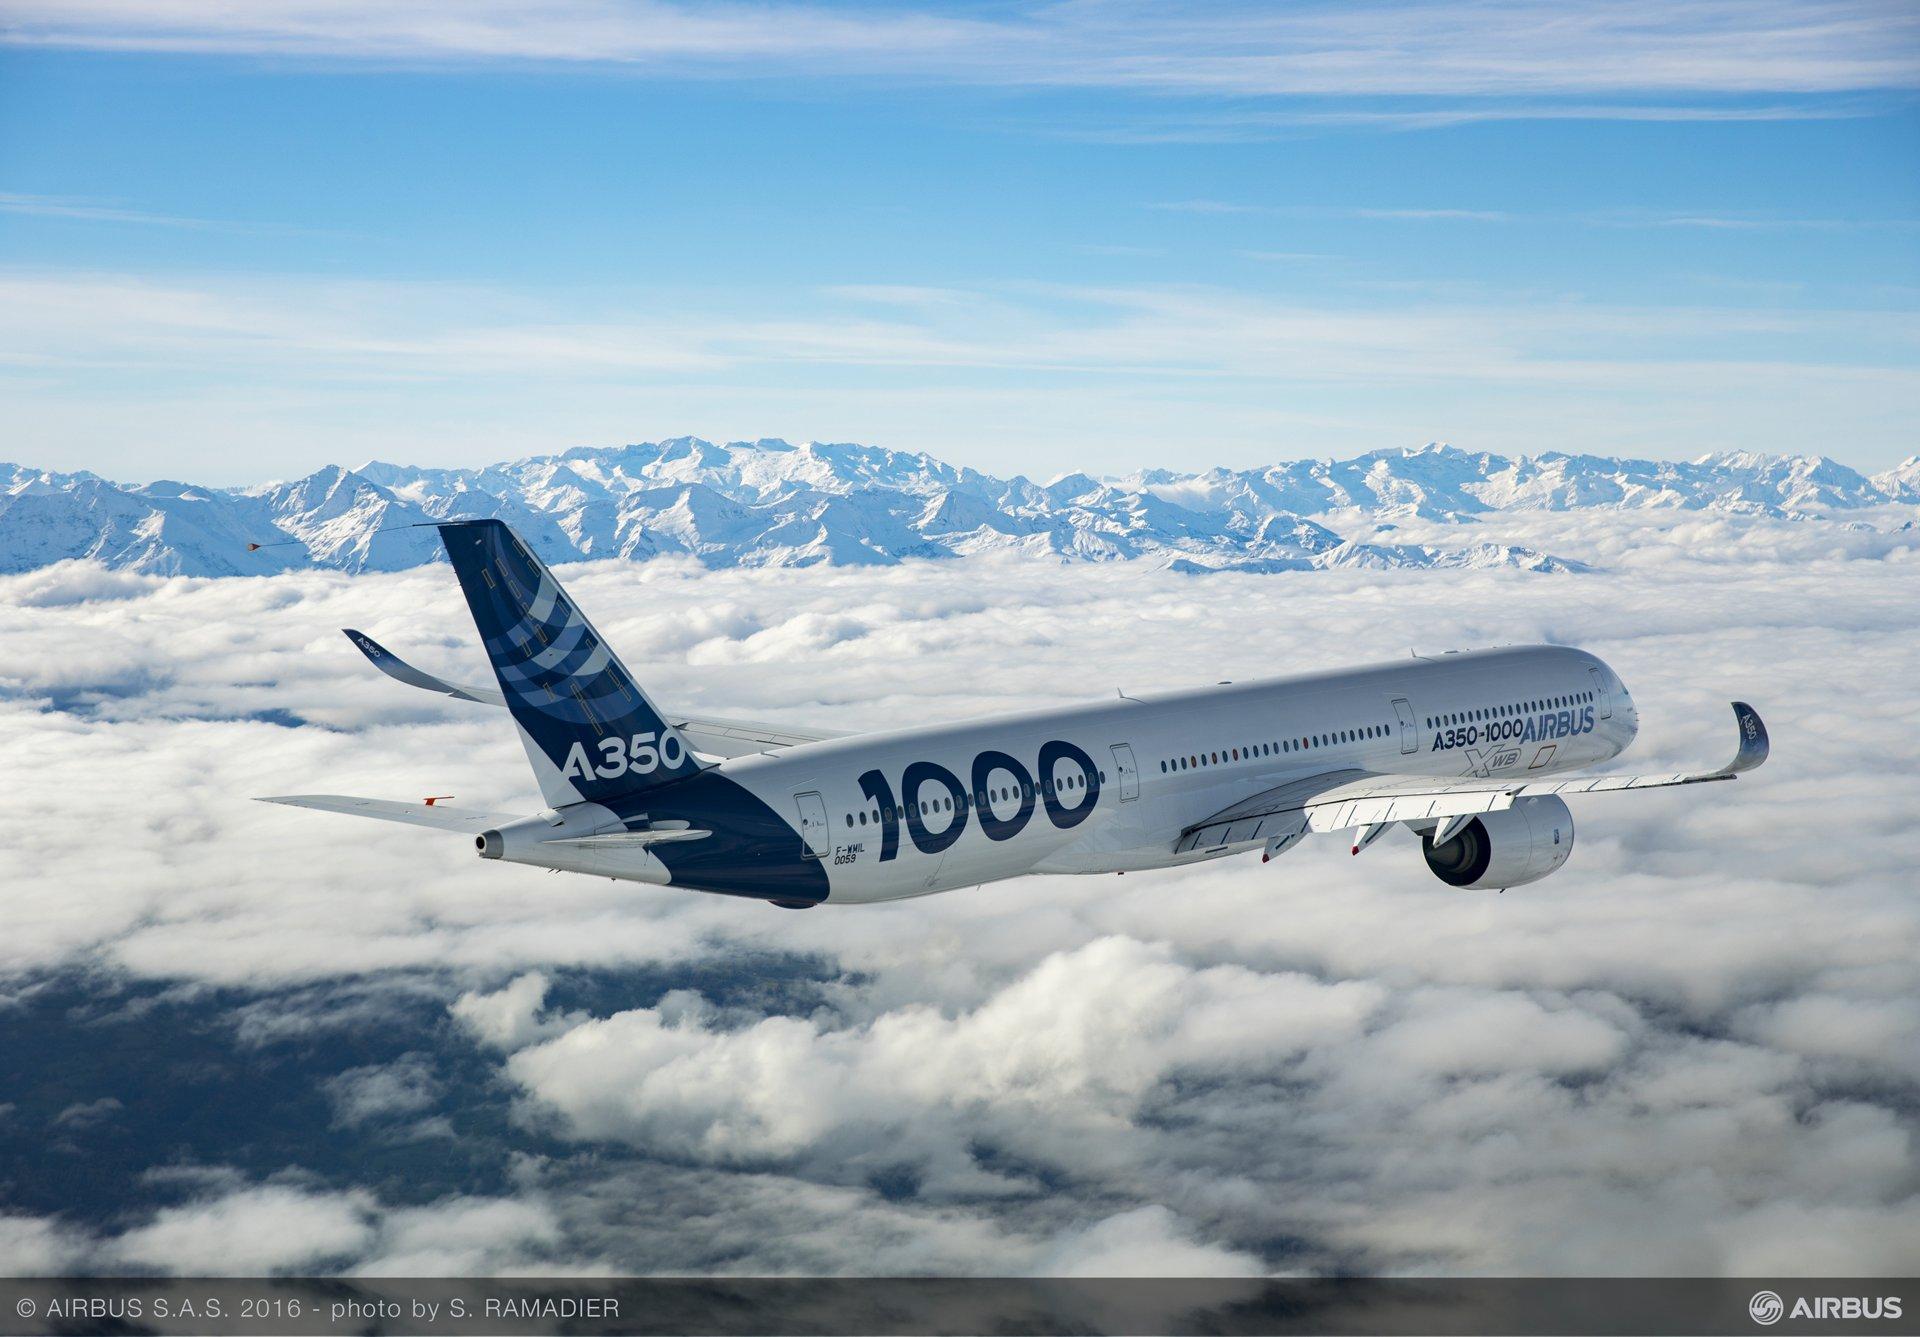 An Airbus XWB A350-1000 aircraft. Photo by S. Ramadier, Airbus